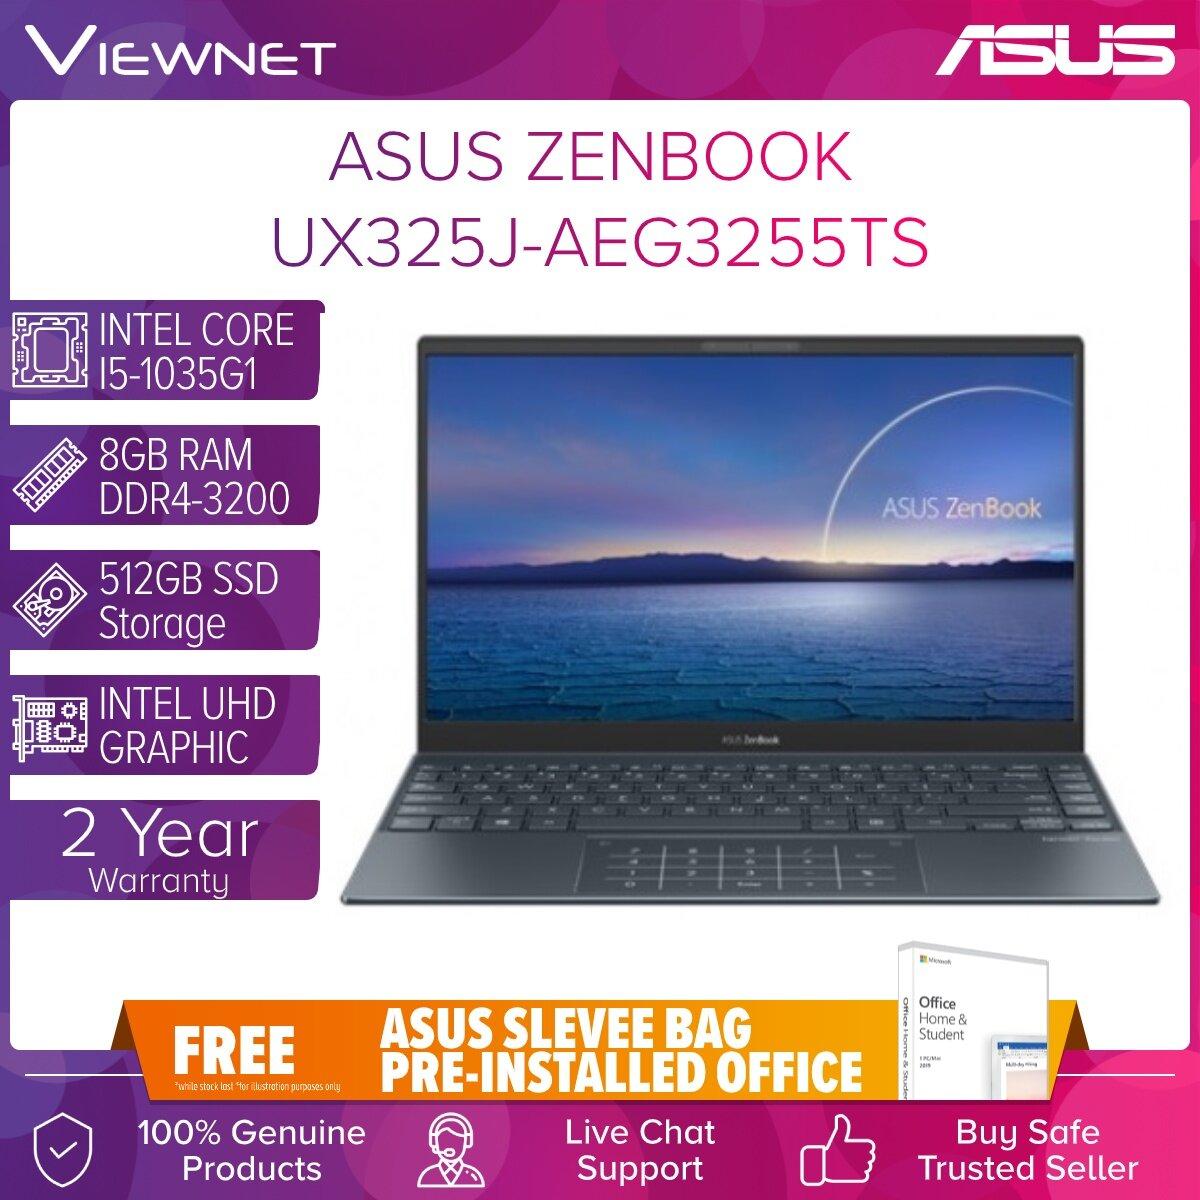 ASUS ZENBOOK 13 UX325J-AEG3255TS LAPTOP INTEL CORE I5-1035G1 8GB DDR4LP 512GB SSD INTEL HD GRAPHIC 13.3